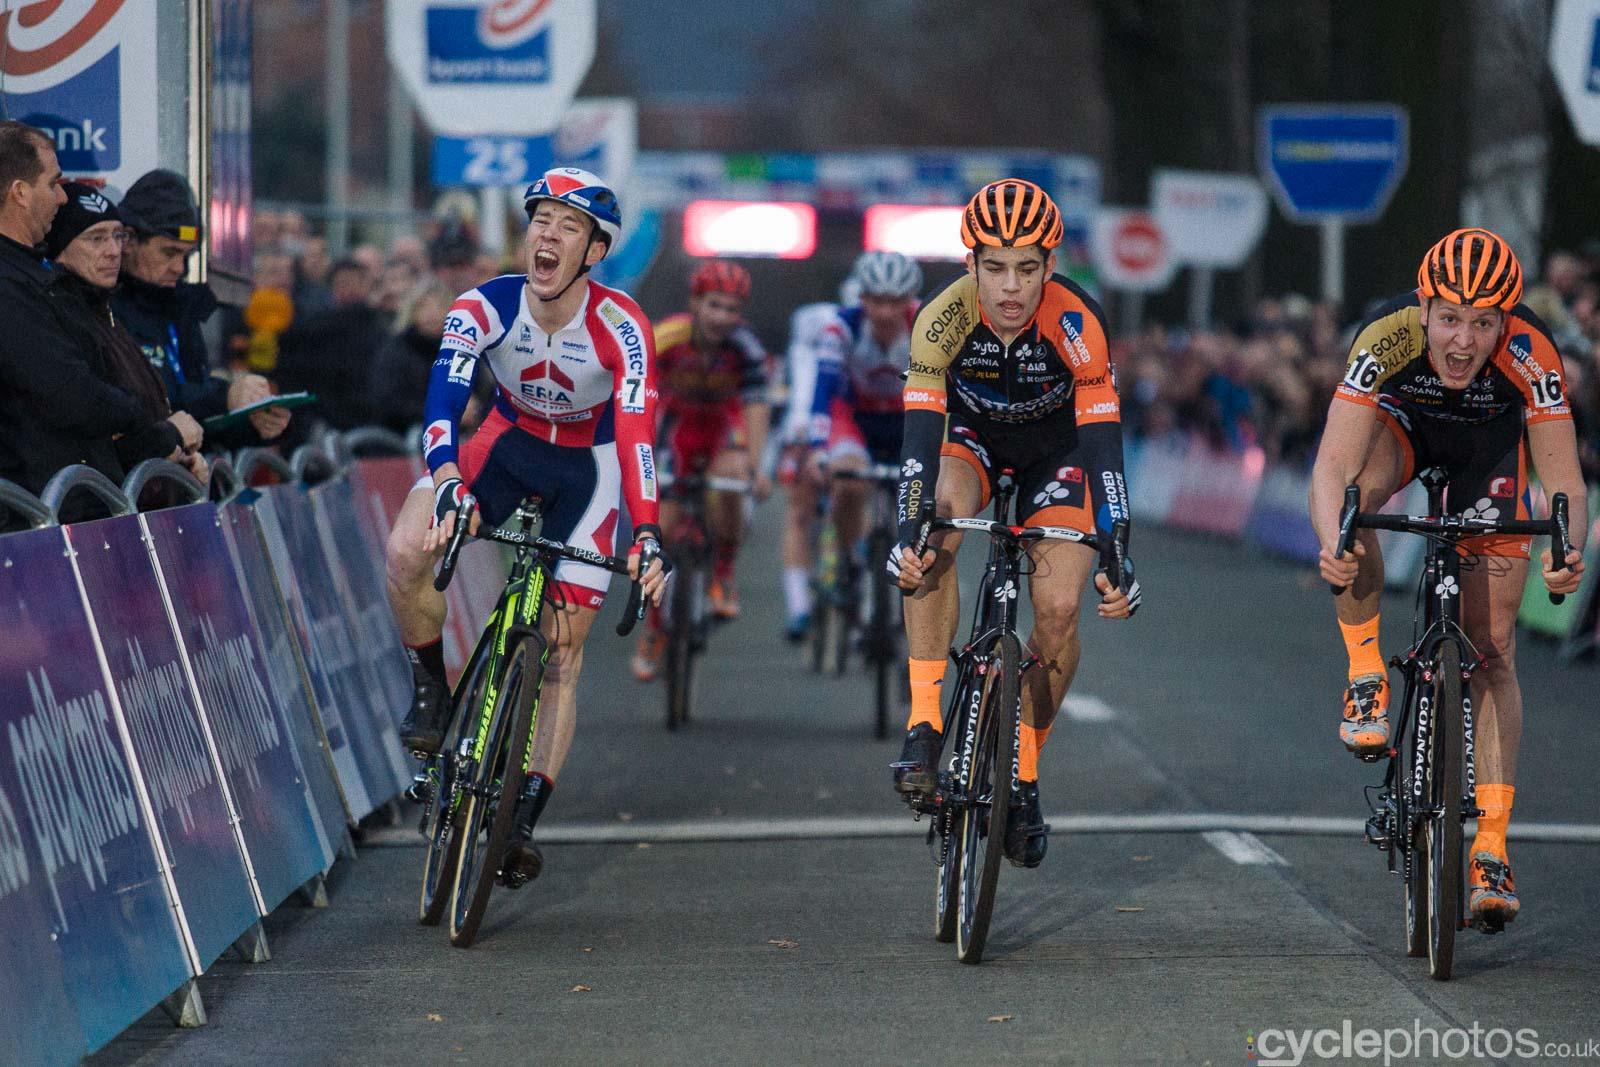 2015-cyclephotos-cyclocross-azencross-155731-sprint-finish